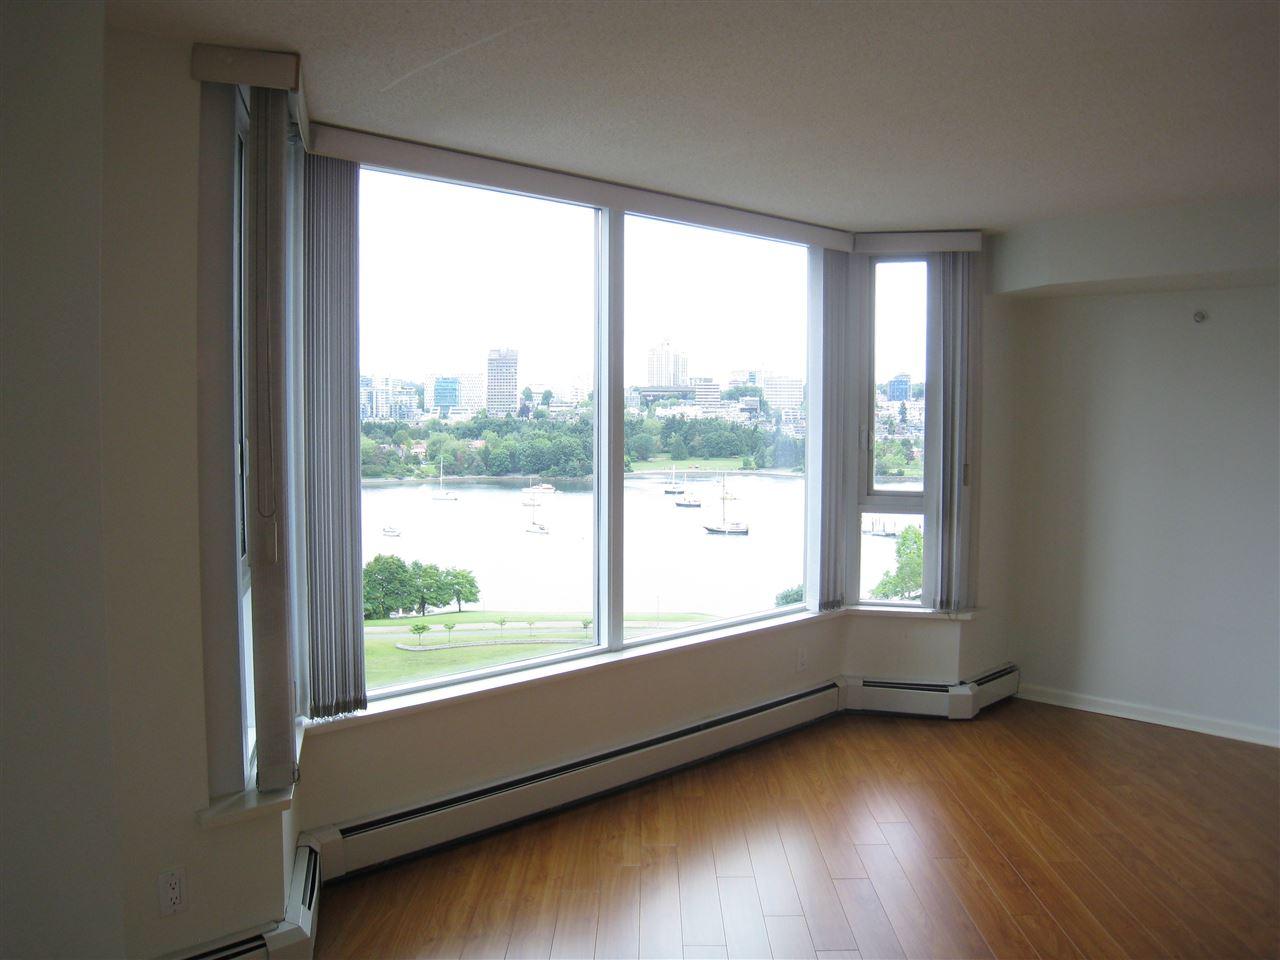 Condo Apartment at 1305 388 DRAKE STREET, Unit 1305, Vancouver West, British Columbia. Image 13